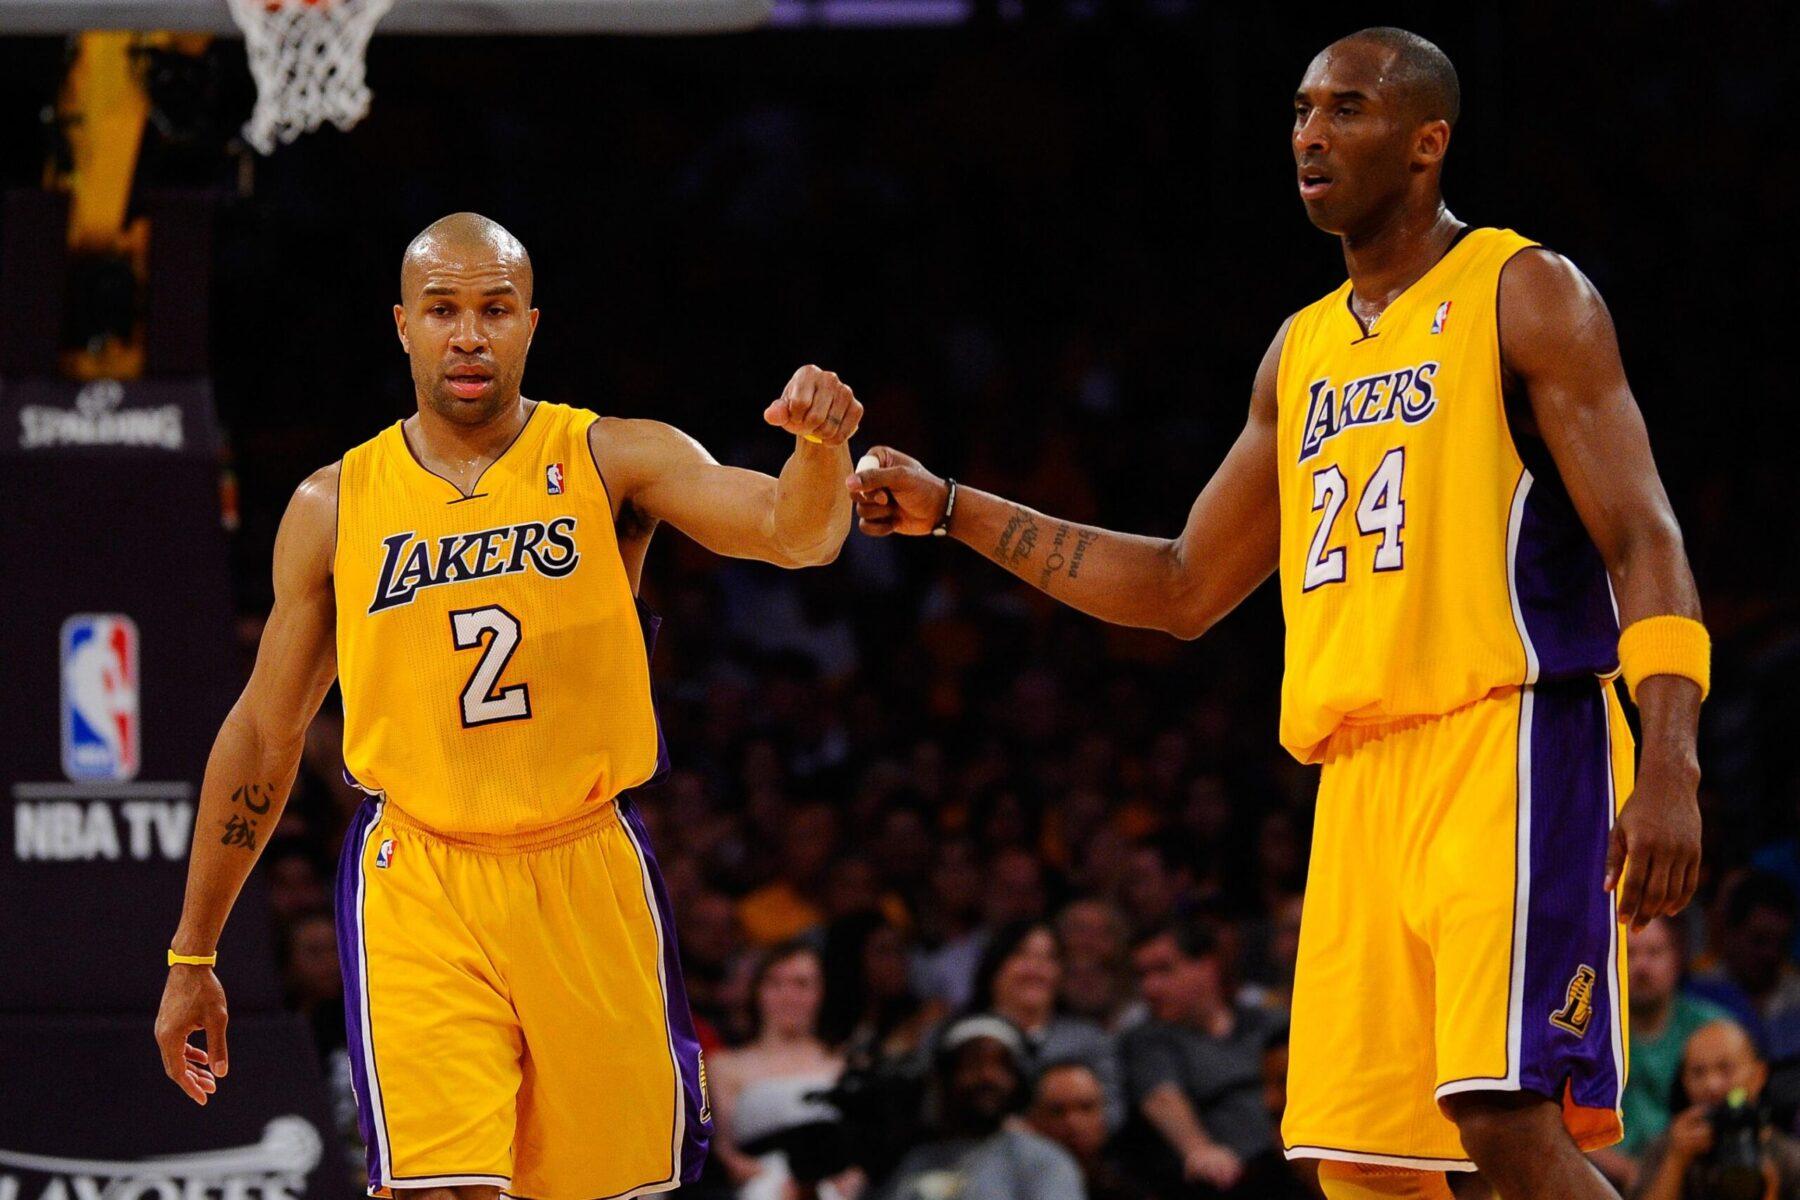 Derek Fisher and Kobe Bryant